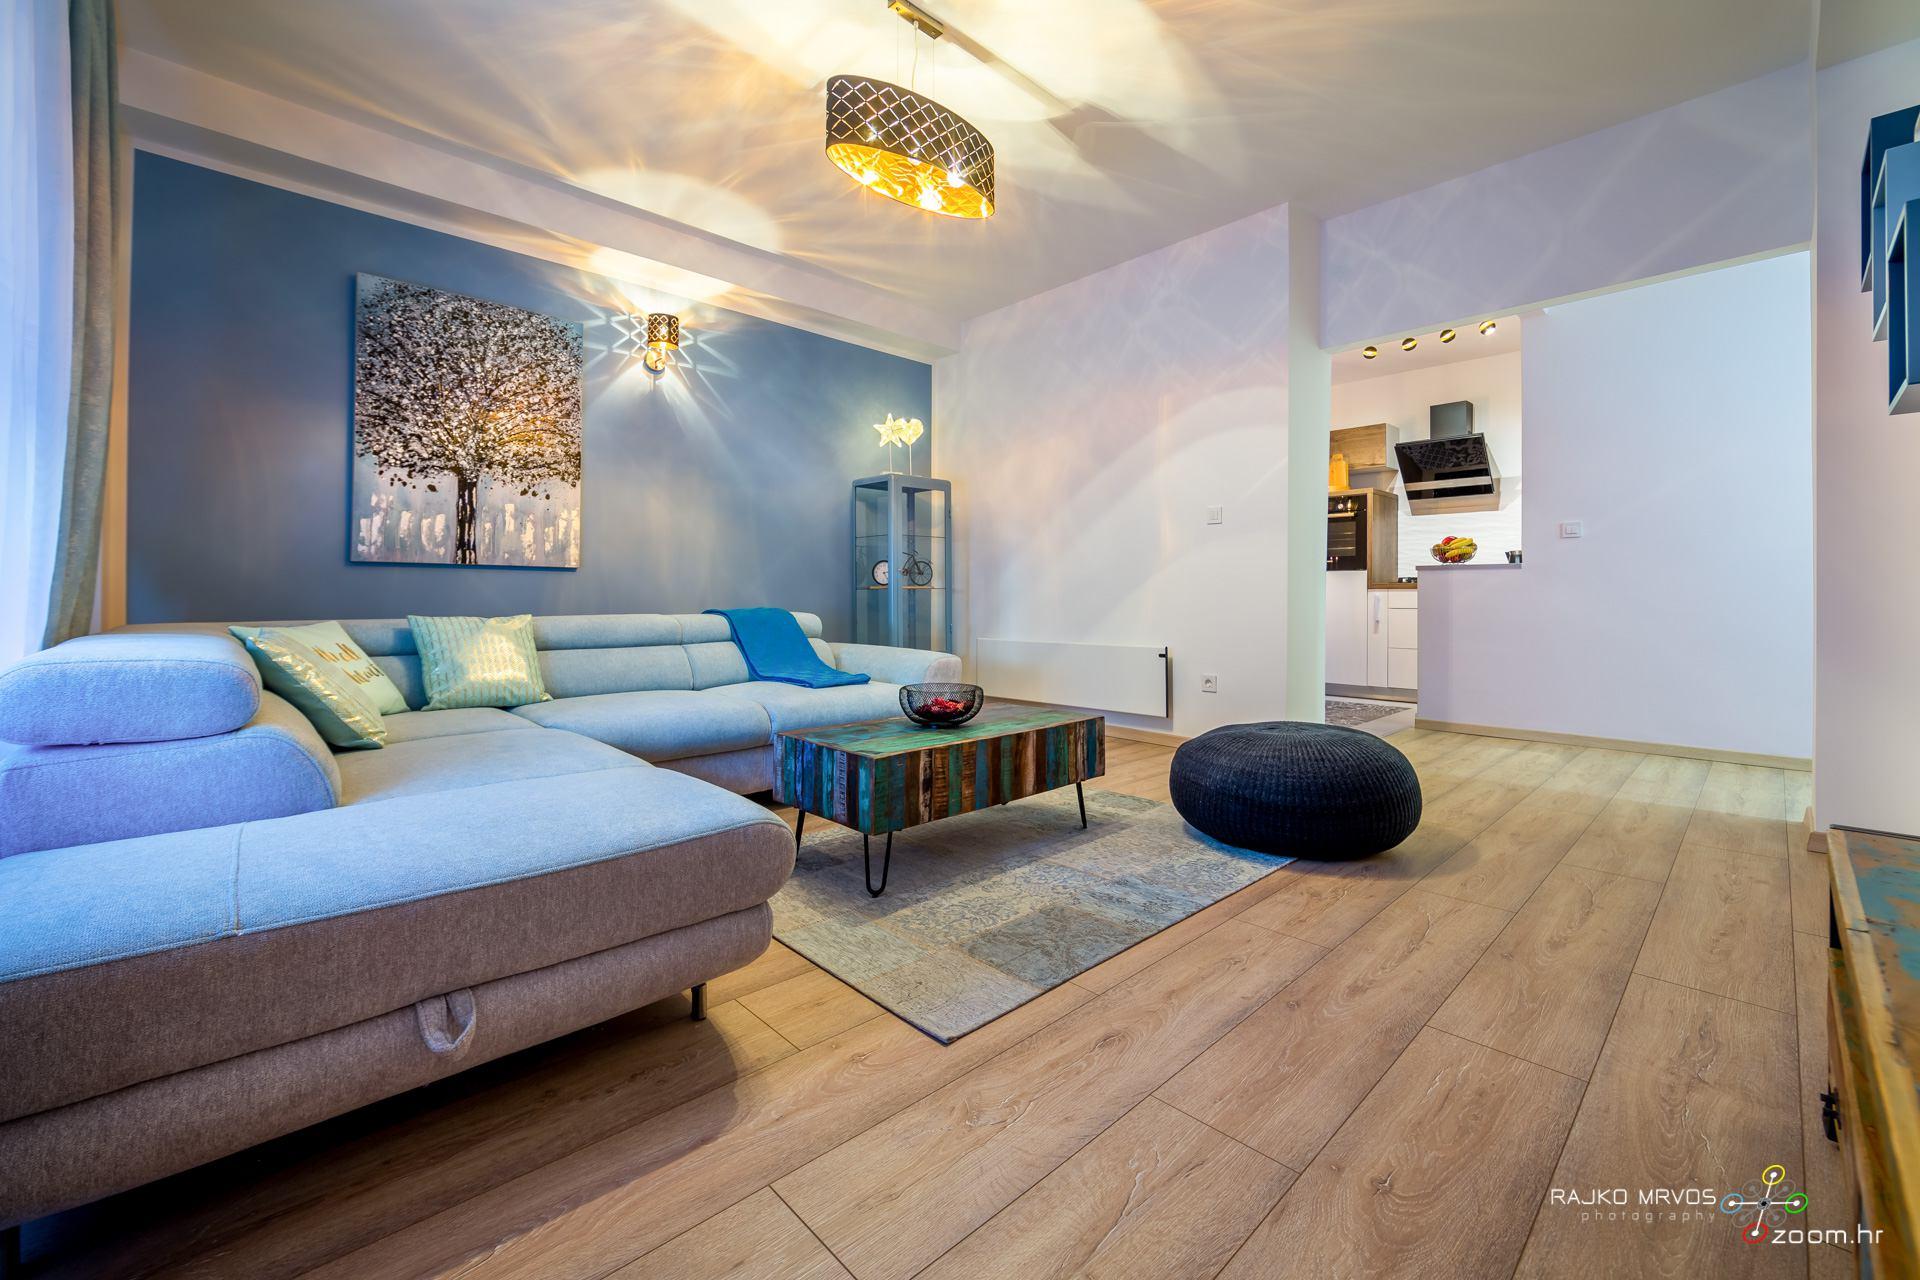 fotografiranje-interijera-fotograf-apartmana-vila-kuca-hotela-apartman-Gabby-Rijeka-12